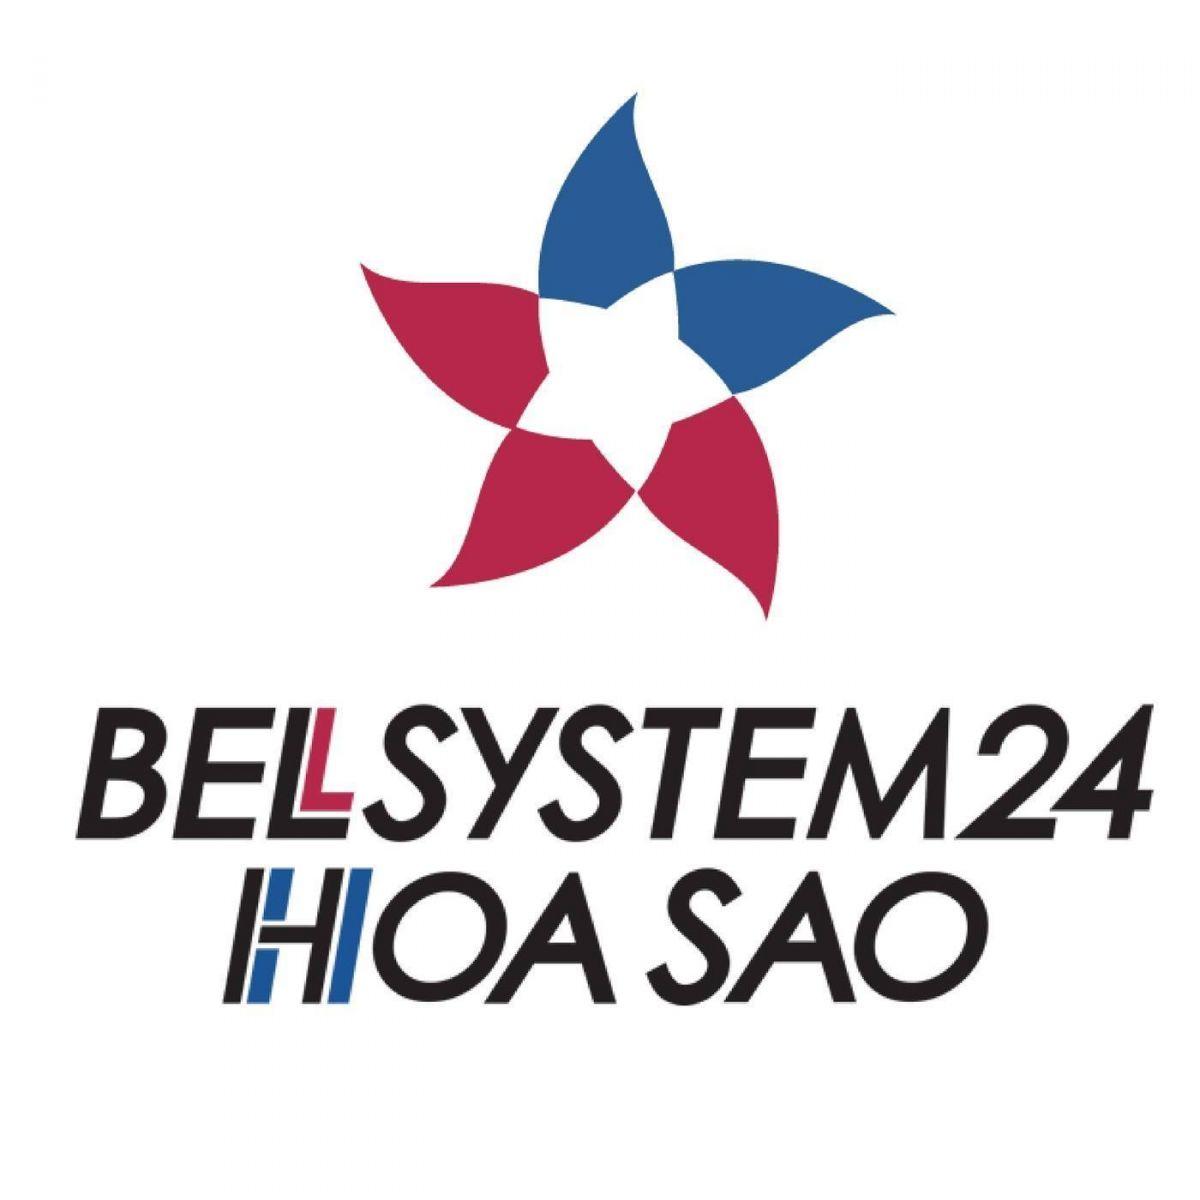 Bellsystem24 Hoa Sao logo